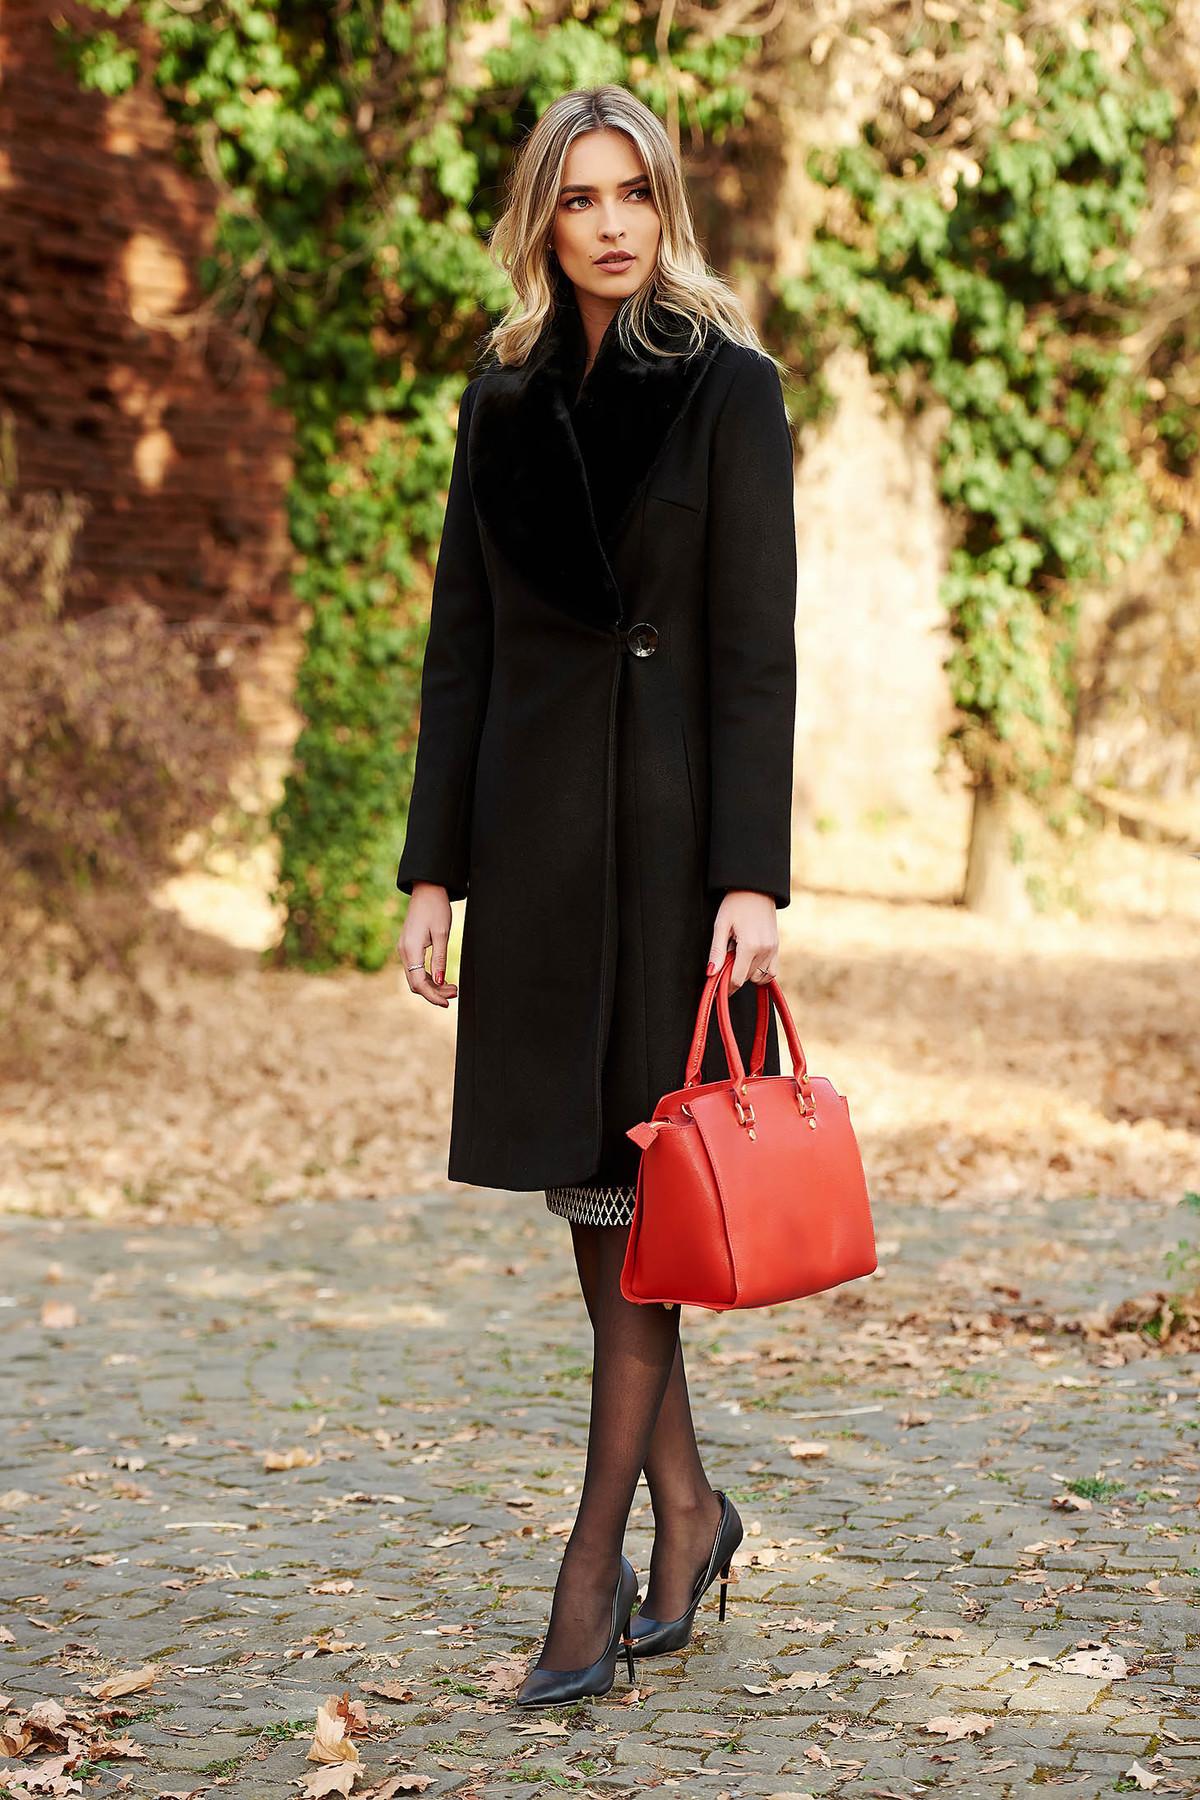 Palton lung negru din stofa moale cu lana intr-o croiala feminina cambrata si incheiere cu un singur nasture LaDonna